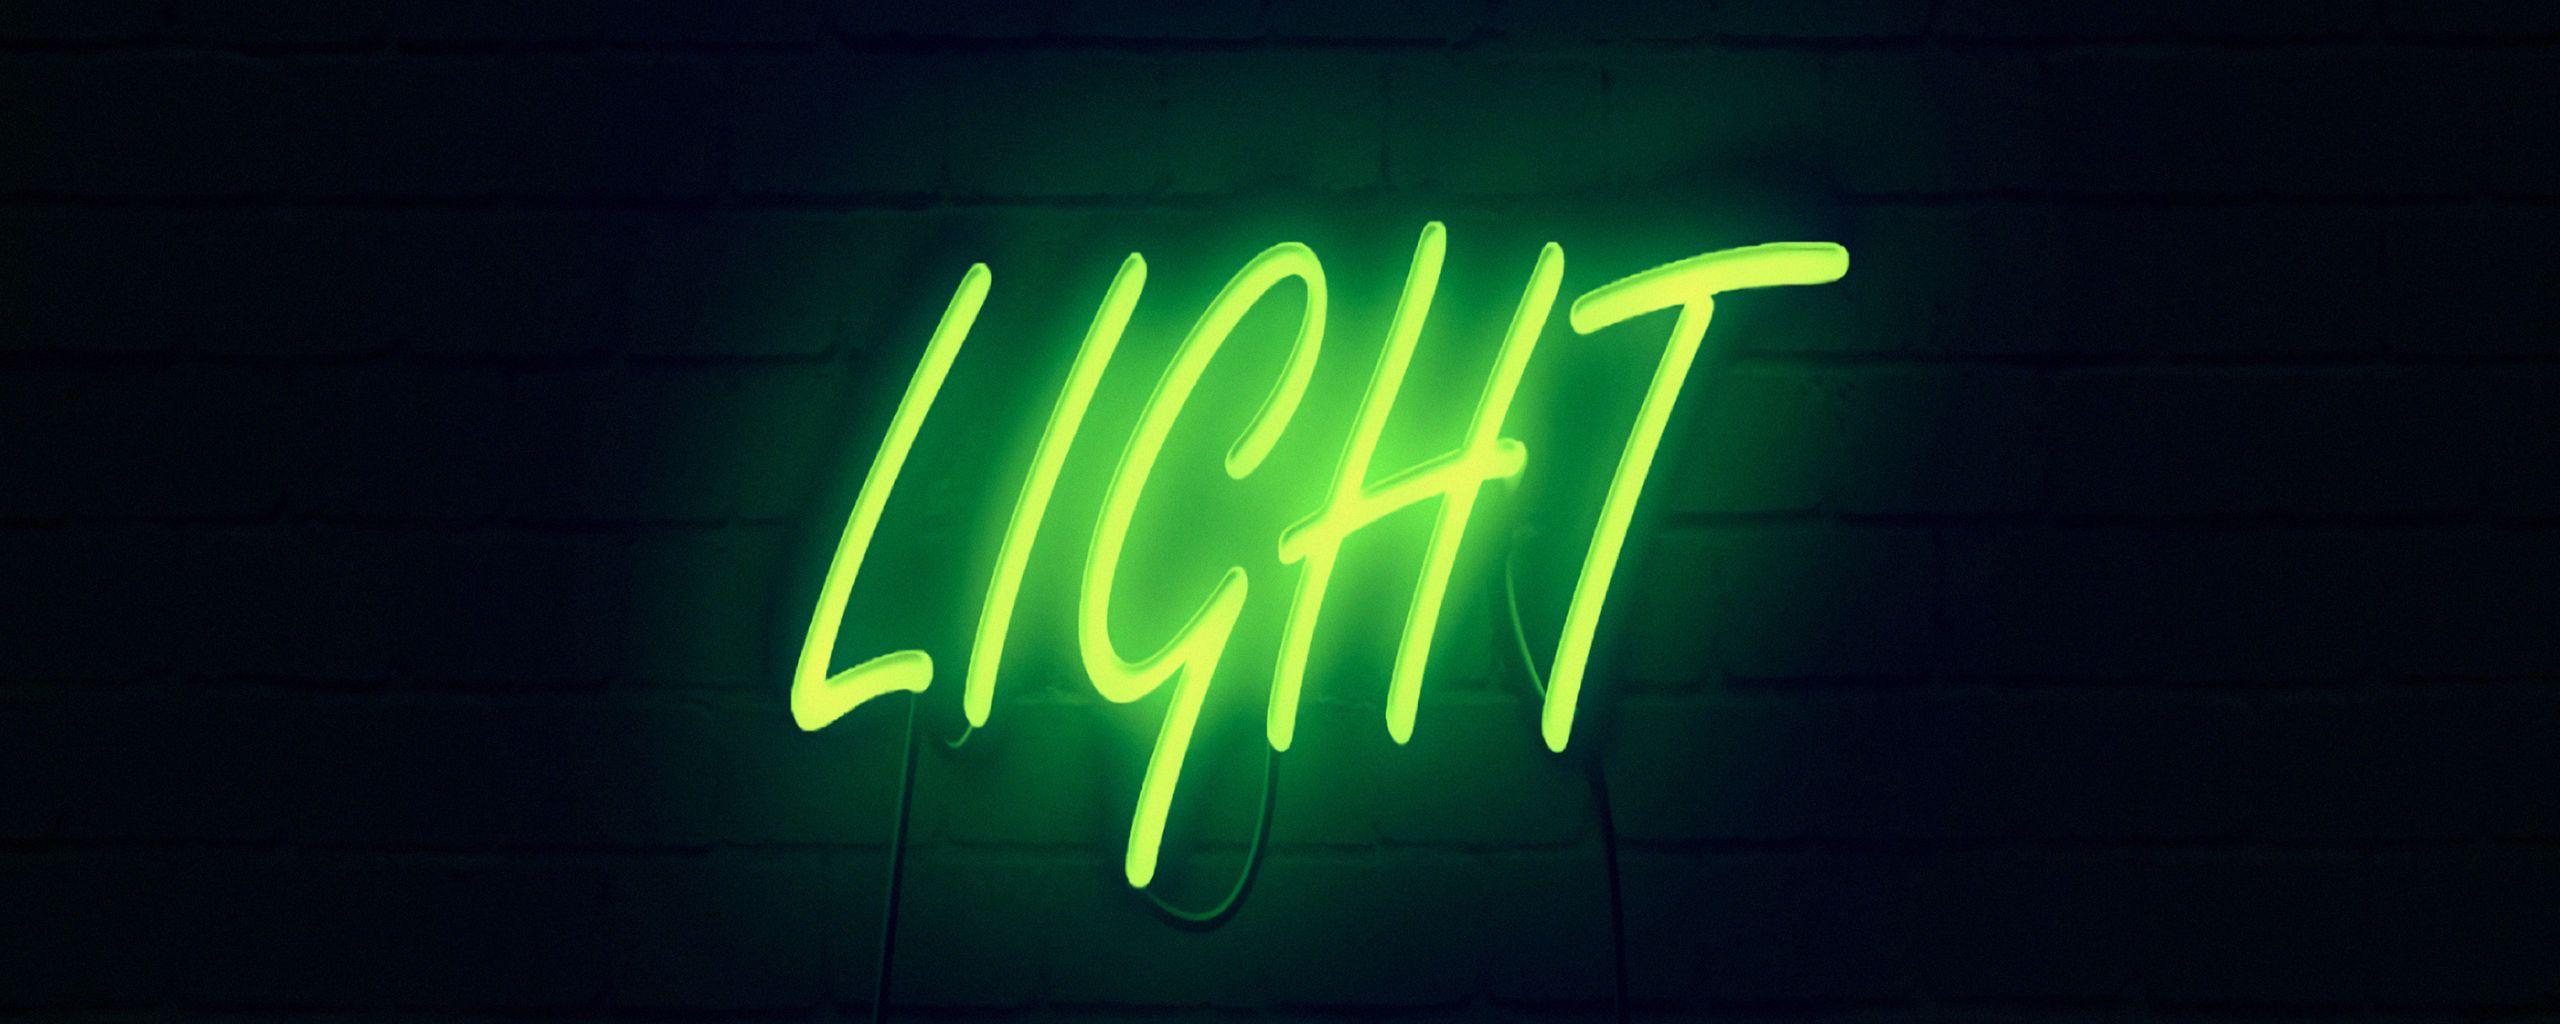 2560x1024 Wallpaper light, neon, inscription, dark, yellow